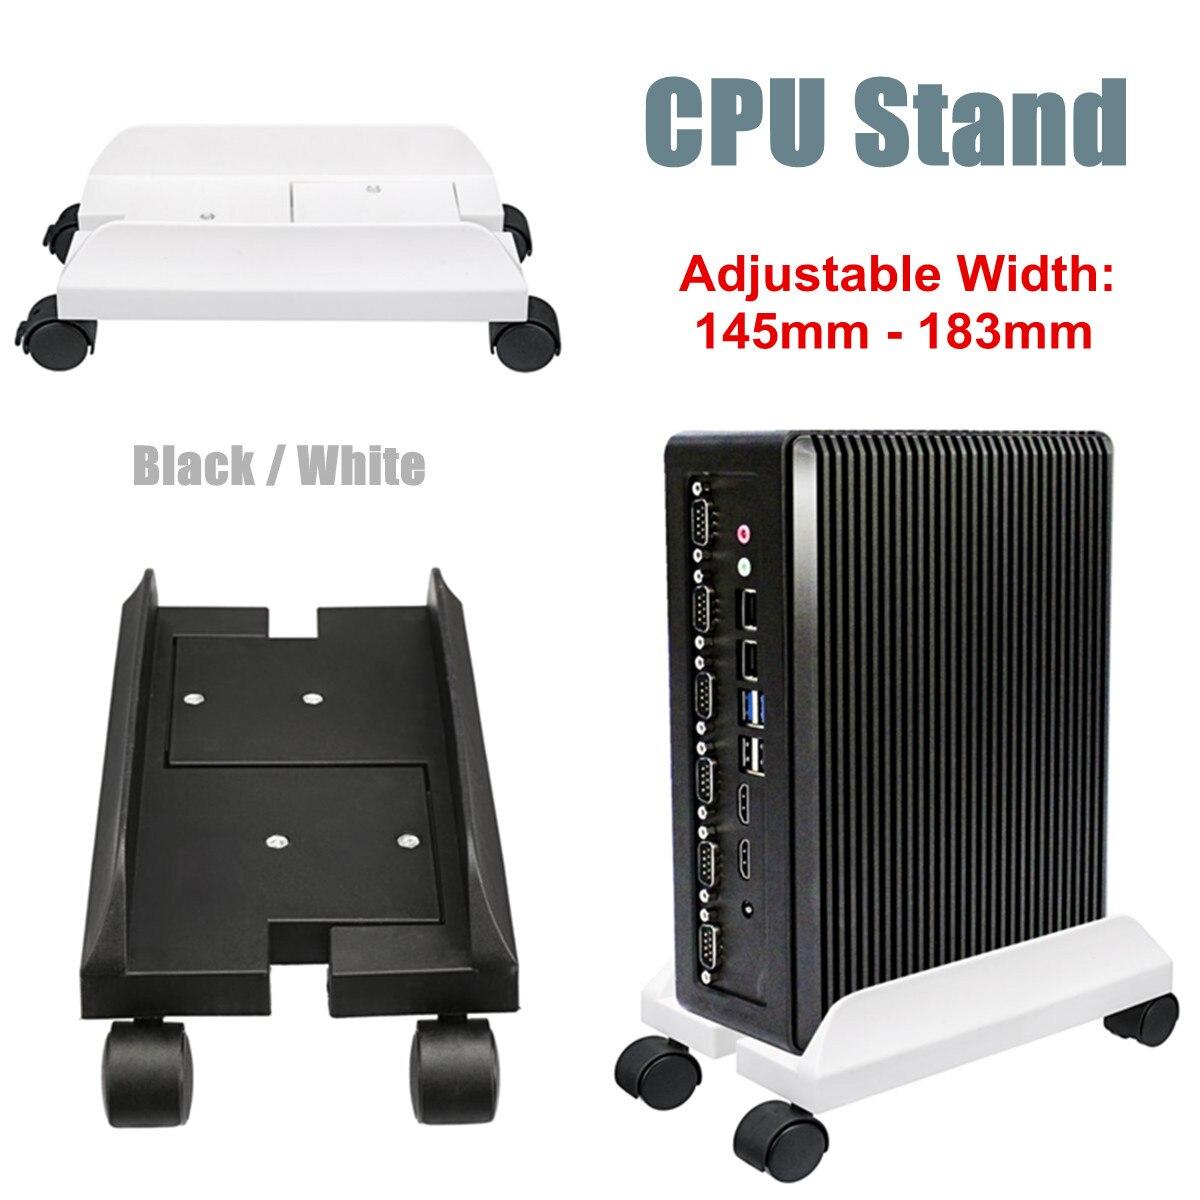 PC Case Desktop CPU Stand Holder Computer Tower Rolling Wheels Adjustable Wide Mobile ABS Plastic Pulley Case Slide